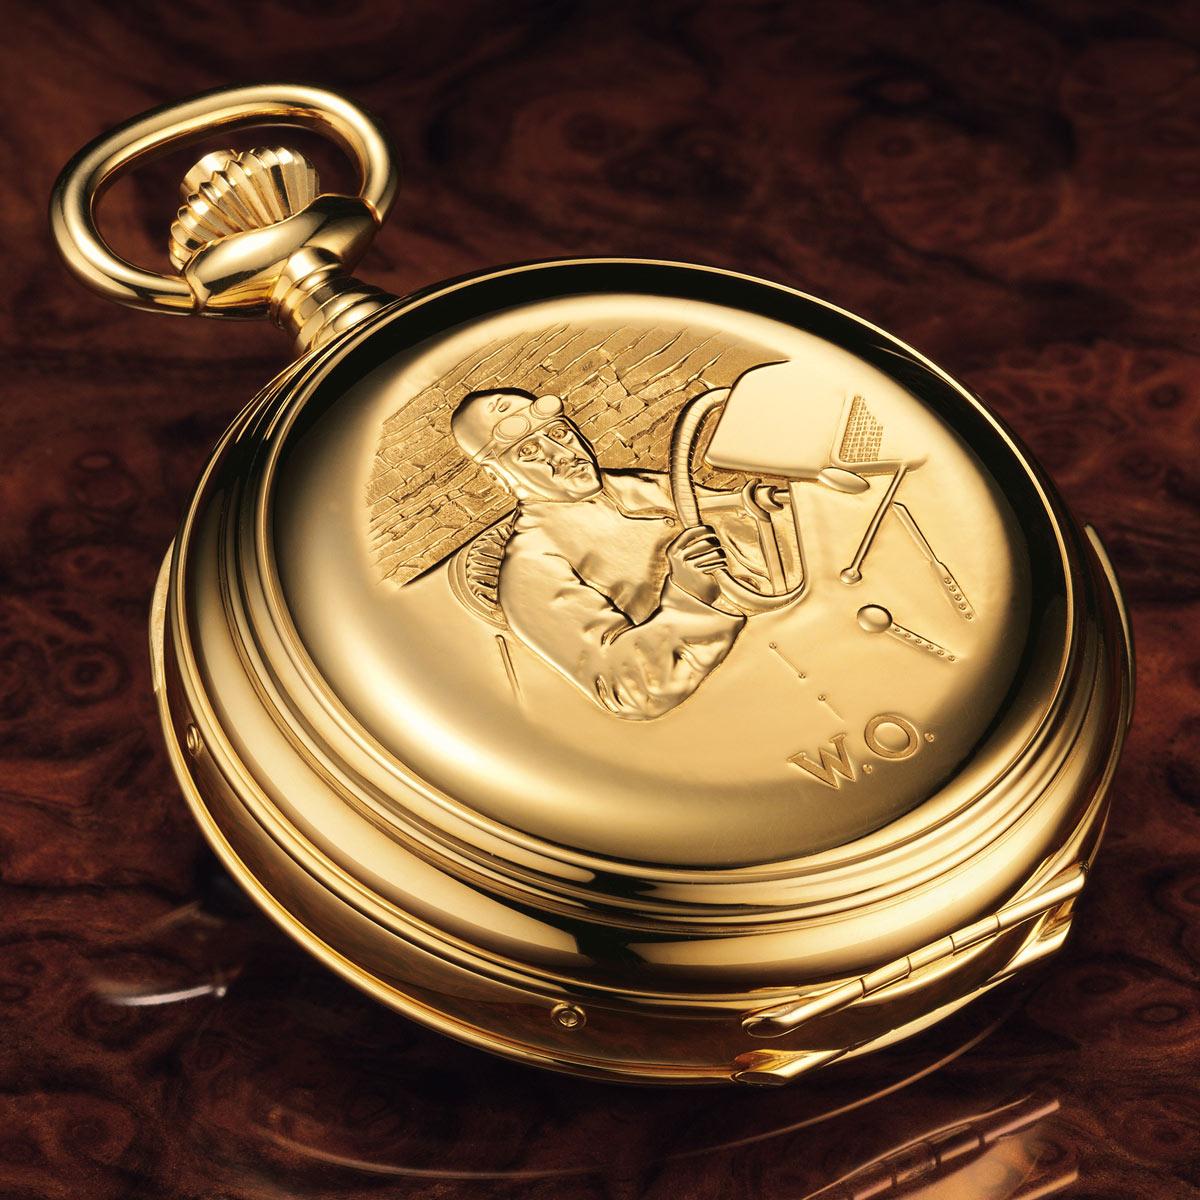 The Watch Quote Photo Breitling Bentley Masterpiece